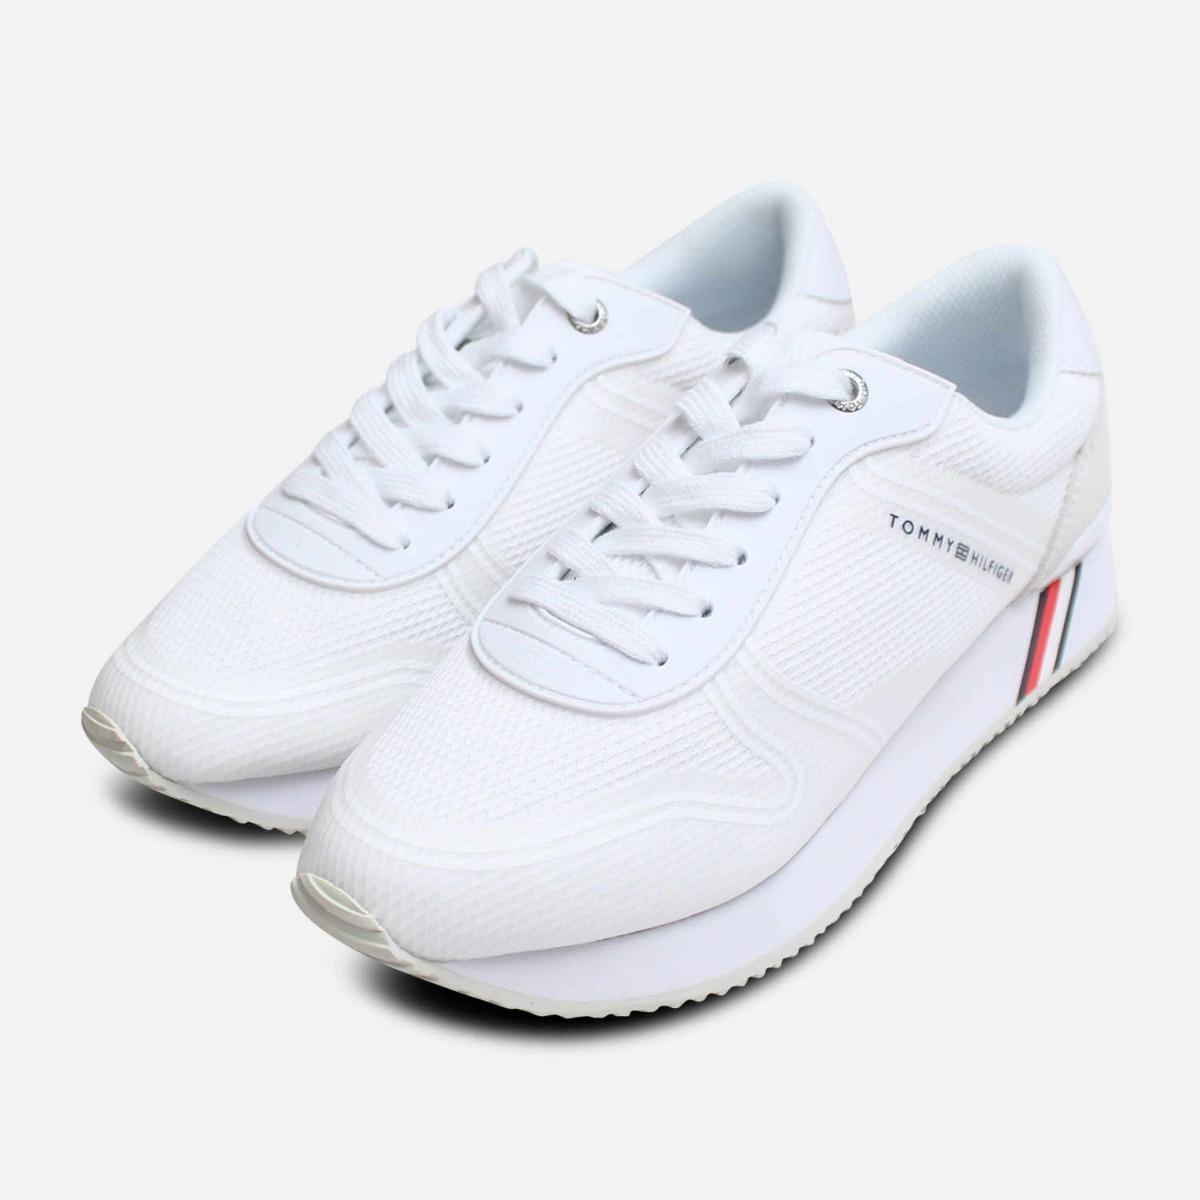 Tommy Hilfiger Femme Sneakers mode 2020 Sneaker Blanc nautique